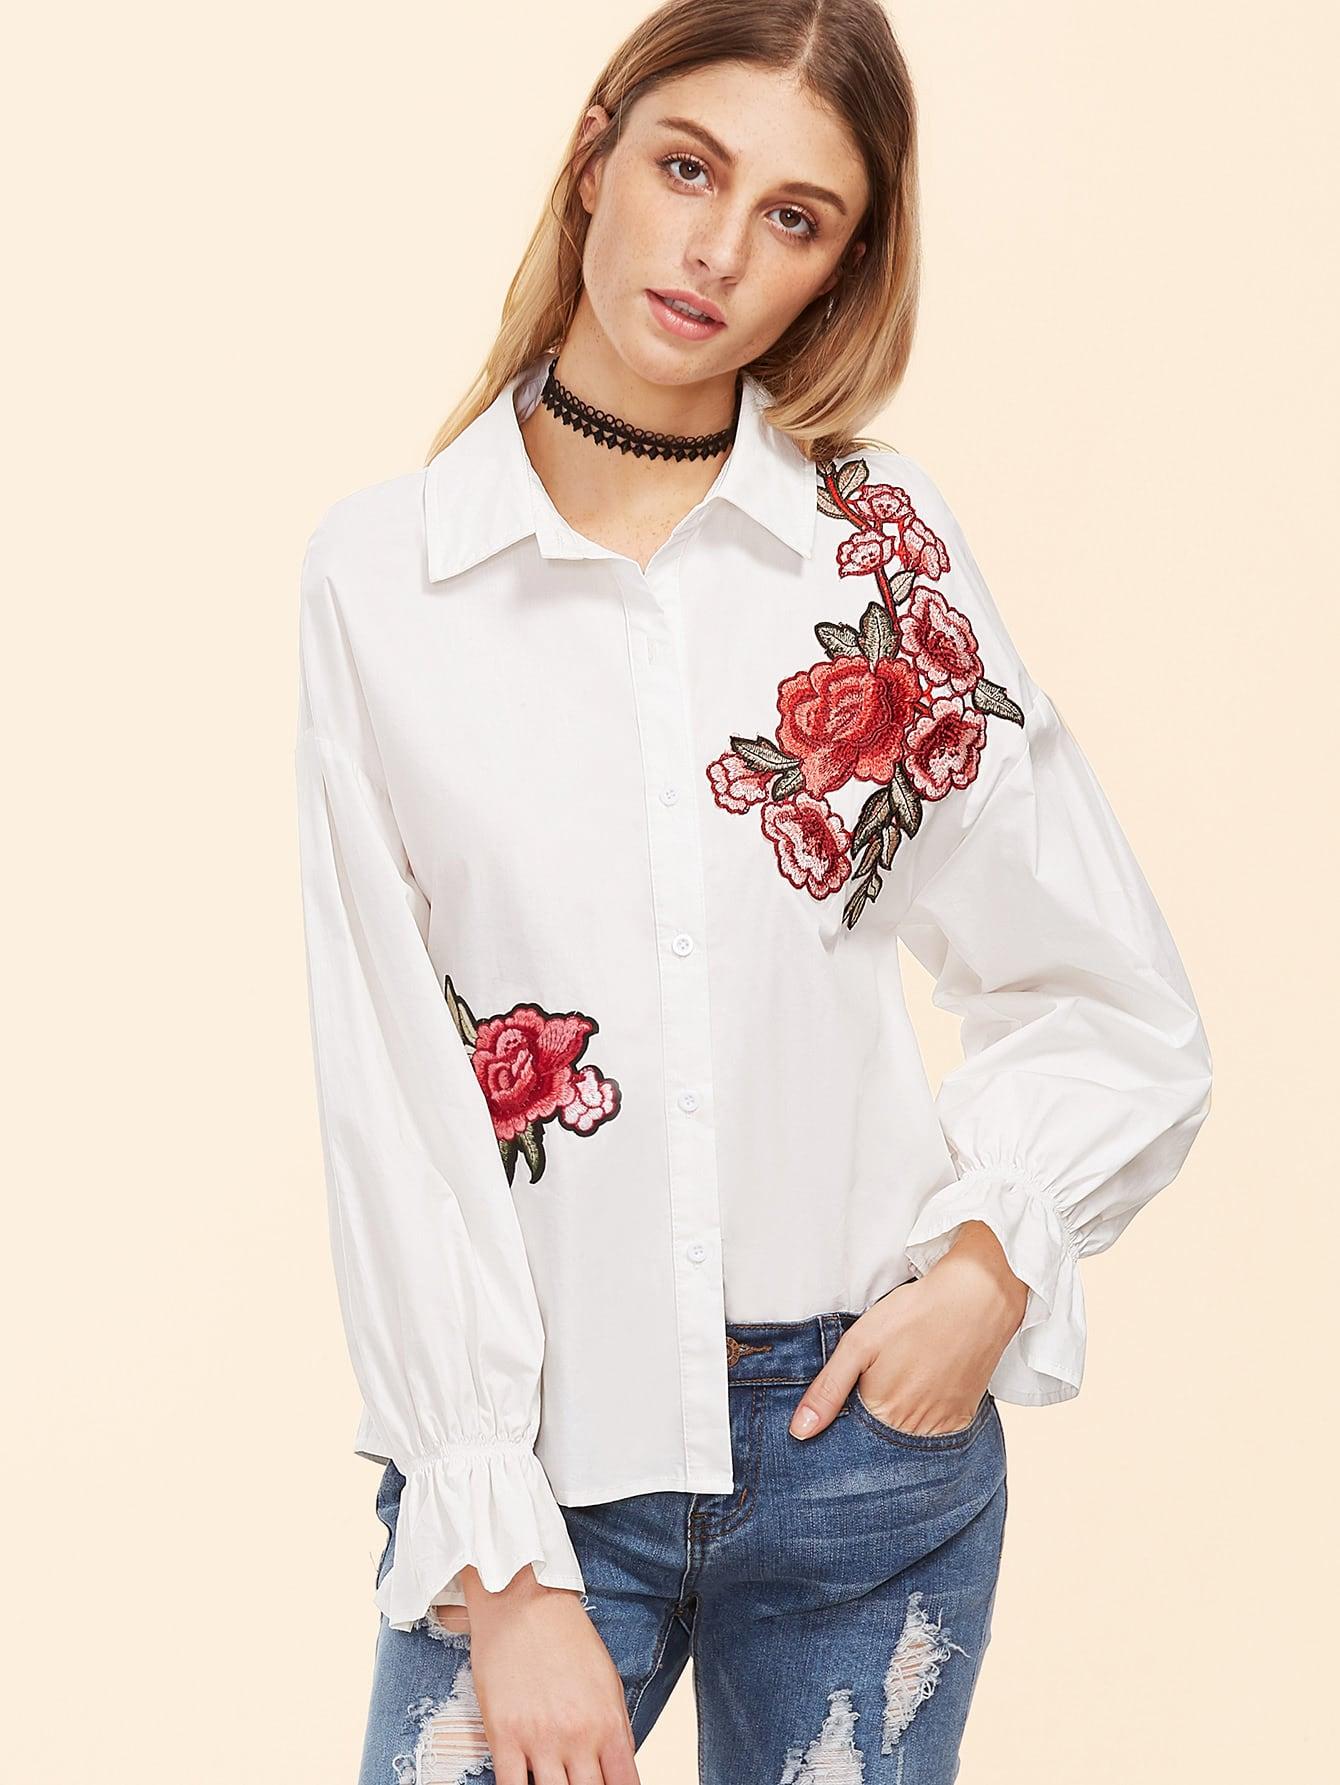 blouse161027701_2